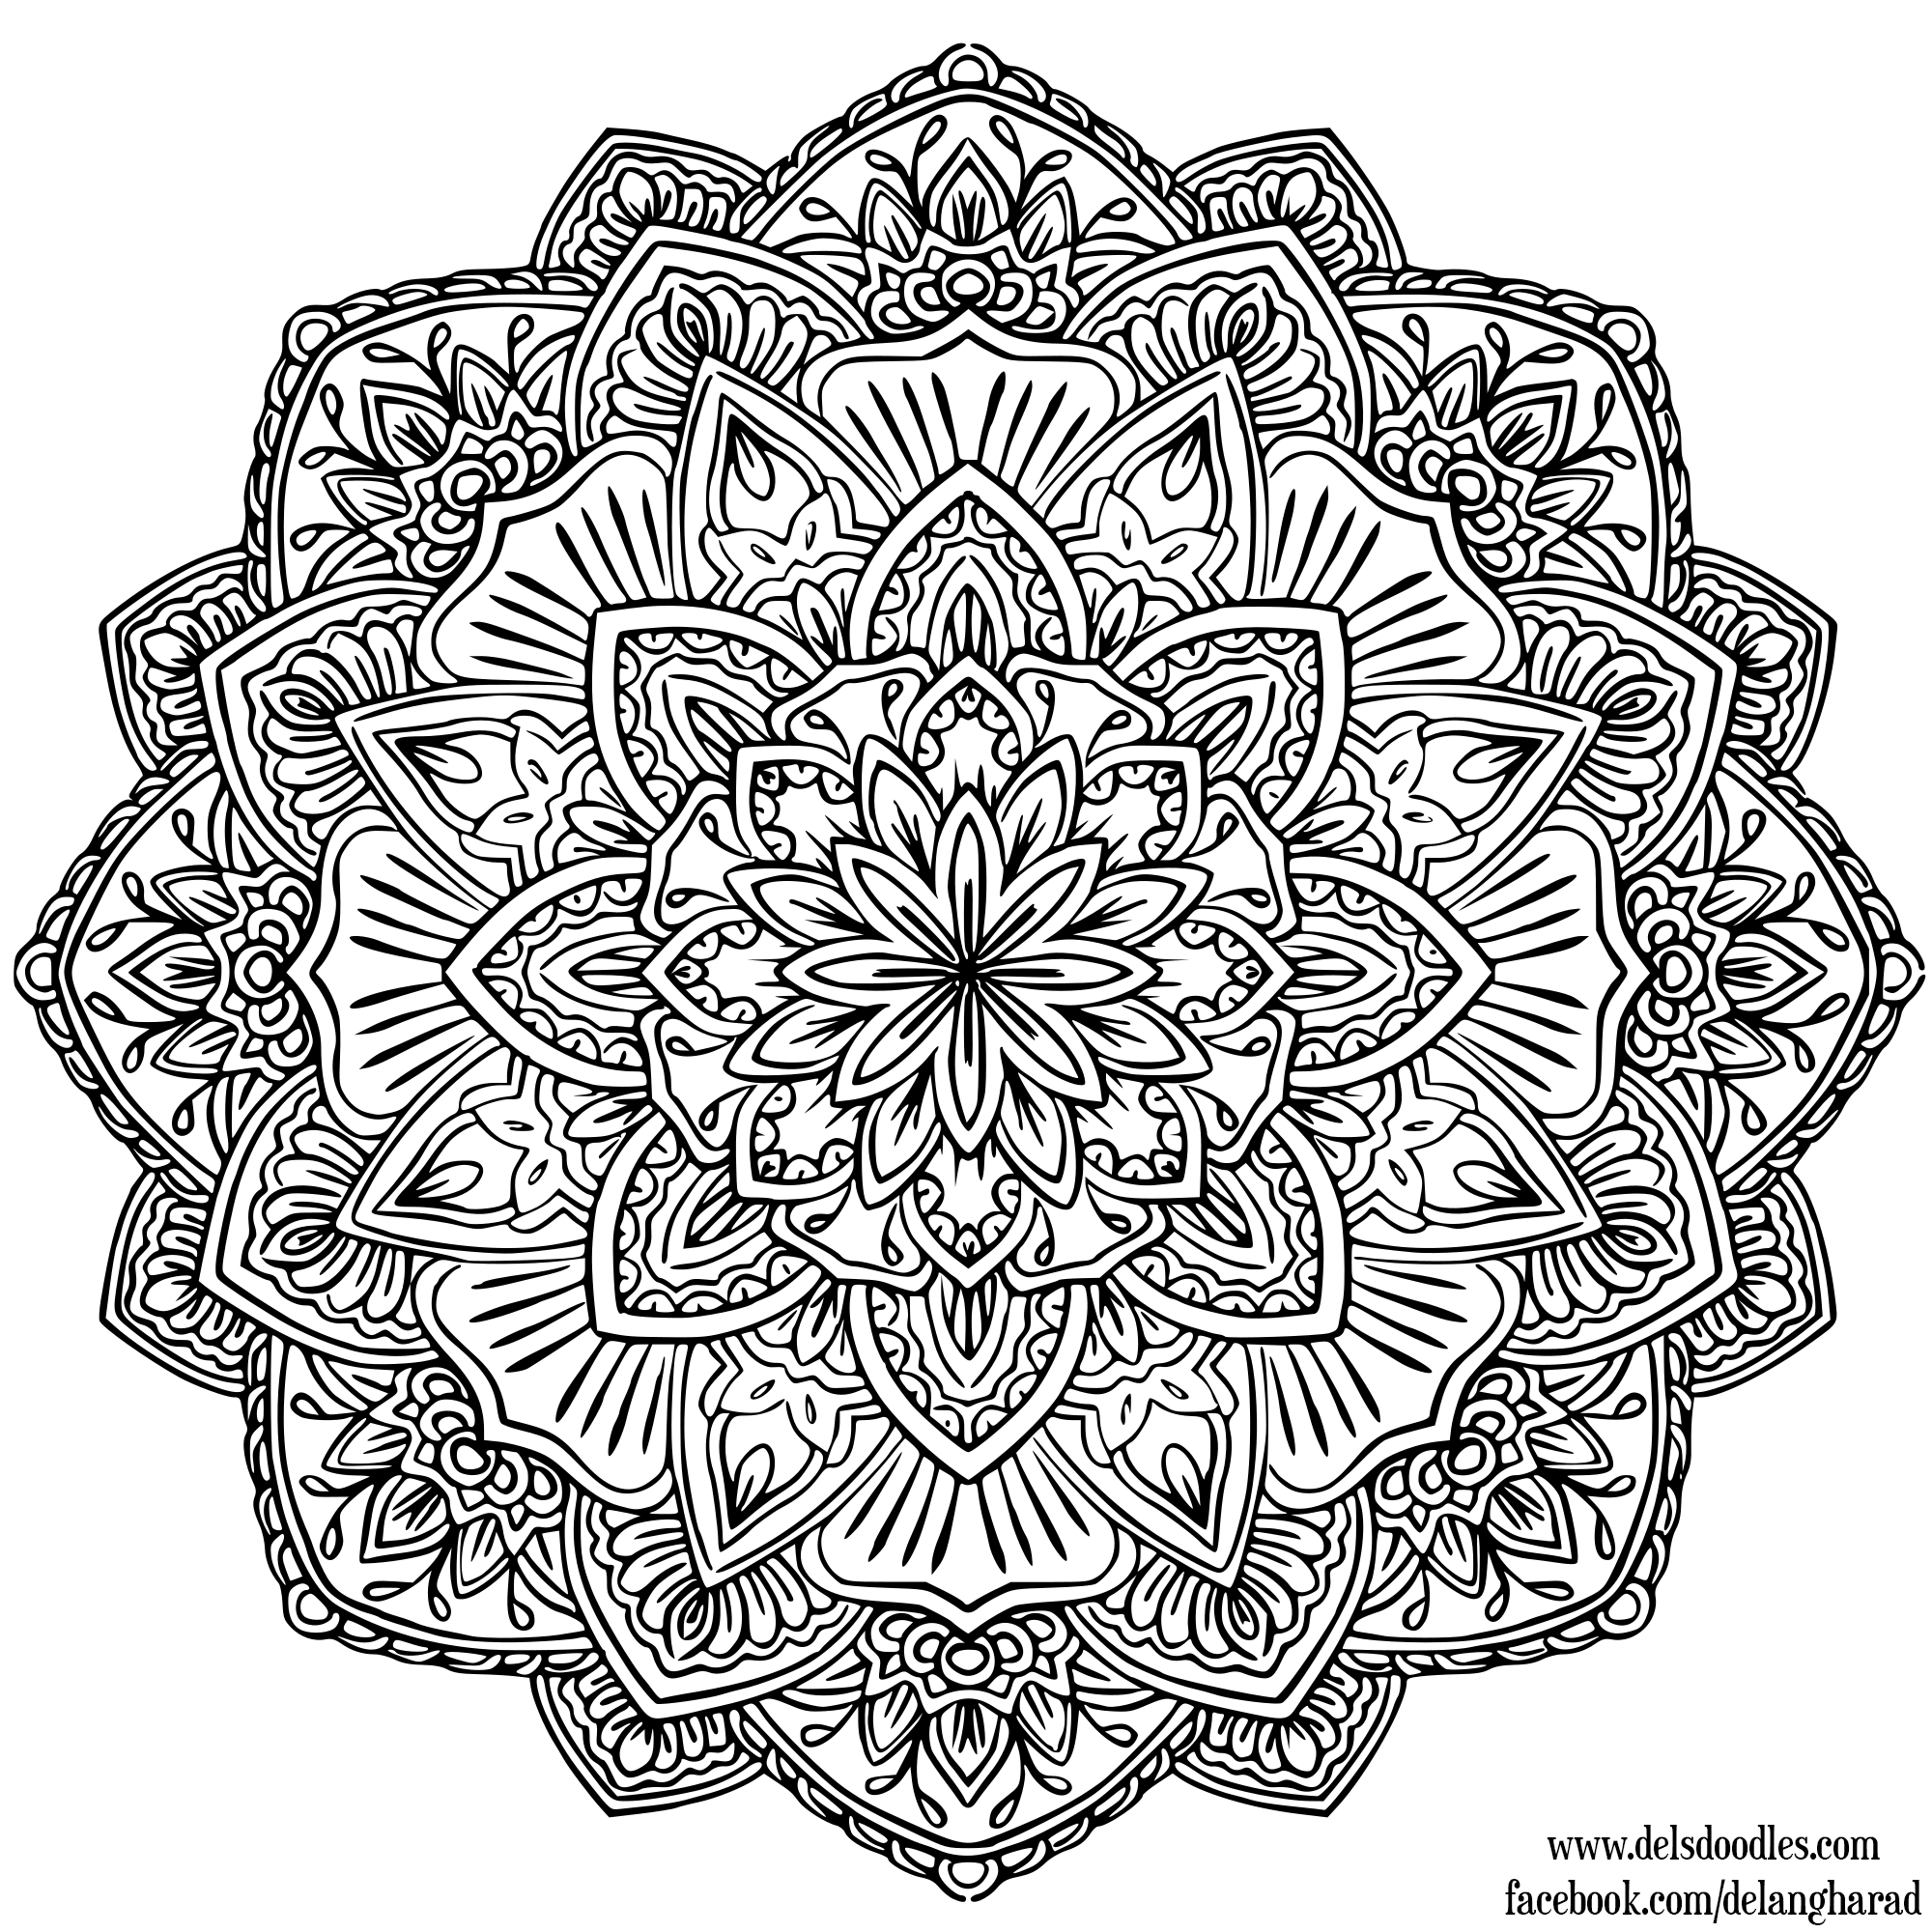 mandala print the meaning and symbolism of the word mandala print mandala